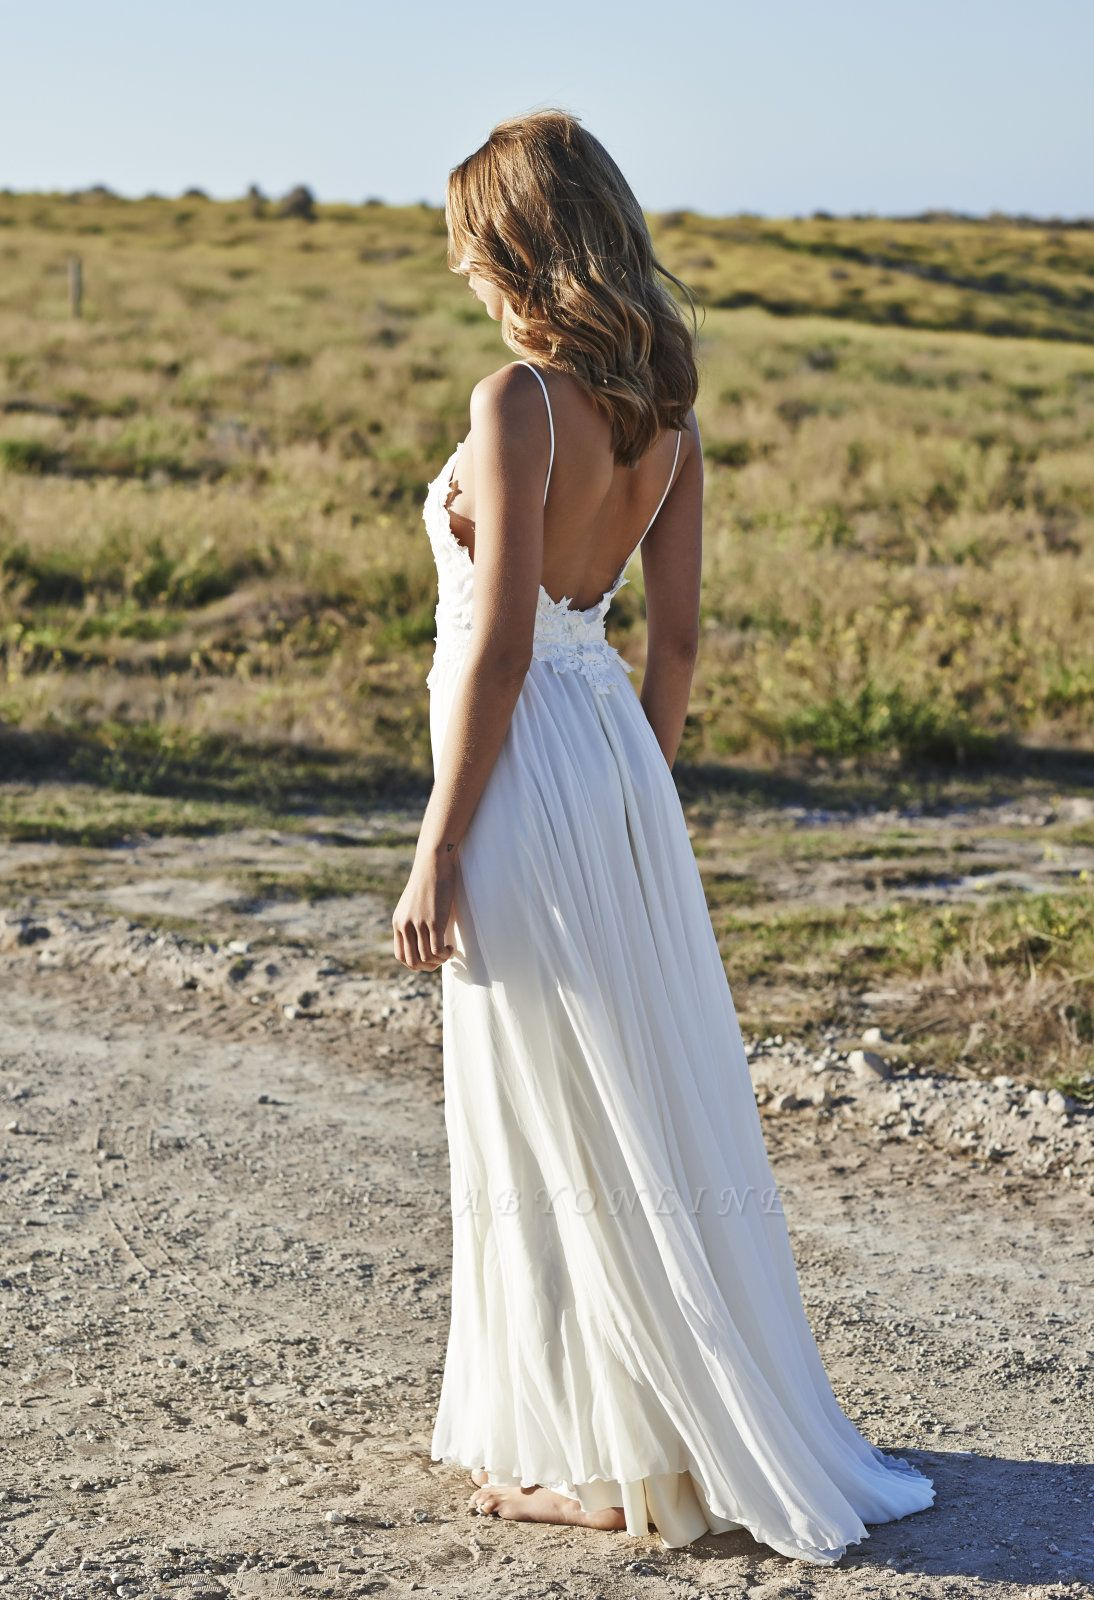 Simple Style Spaghetti Strap V Neck Lace A Line Summer Beach Wedding Dresses